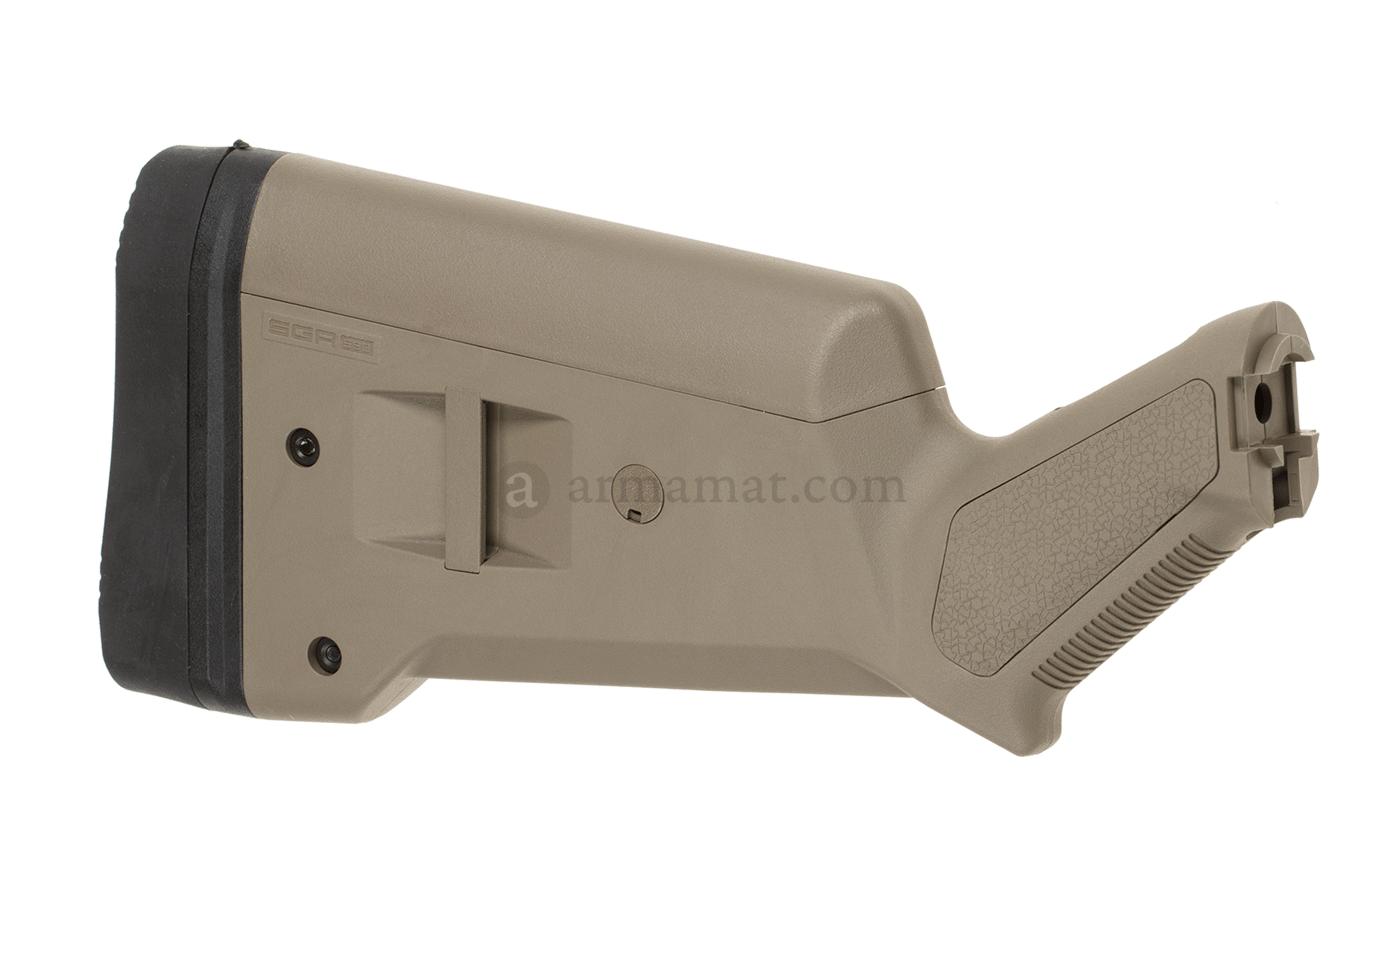 sga500 shotgun stock dark earth magpul 12 gauge